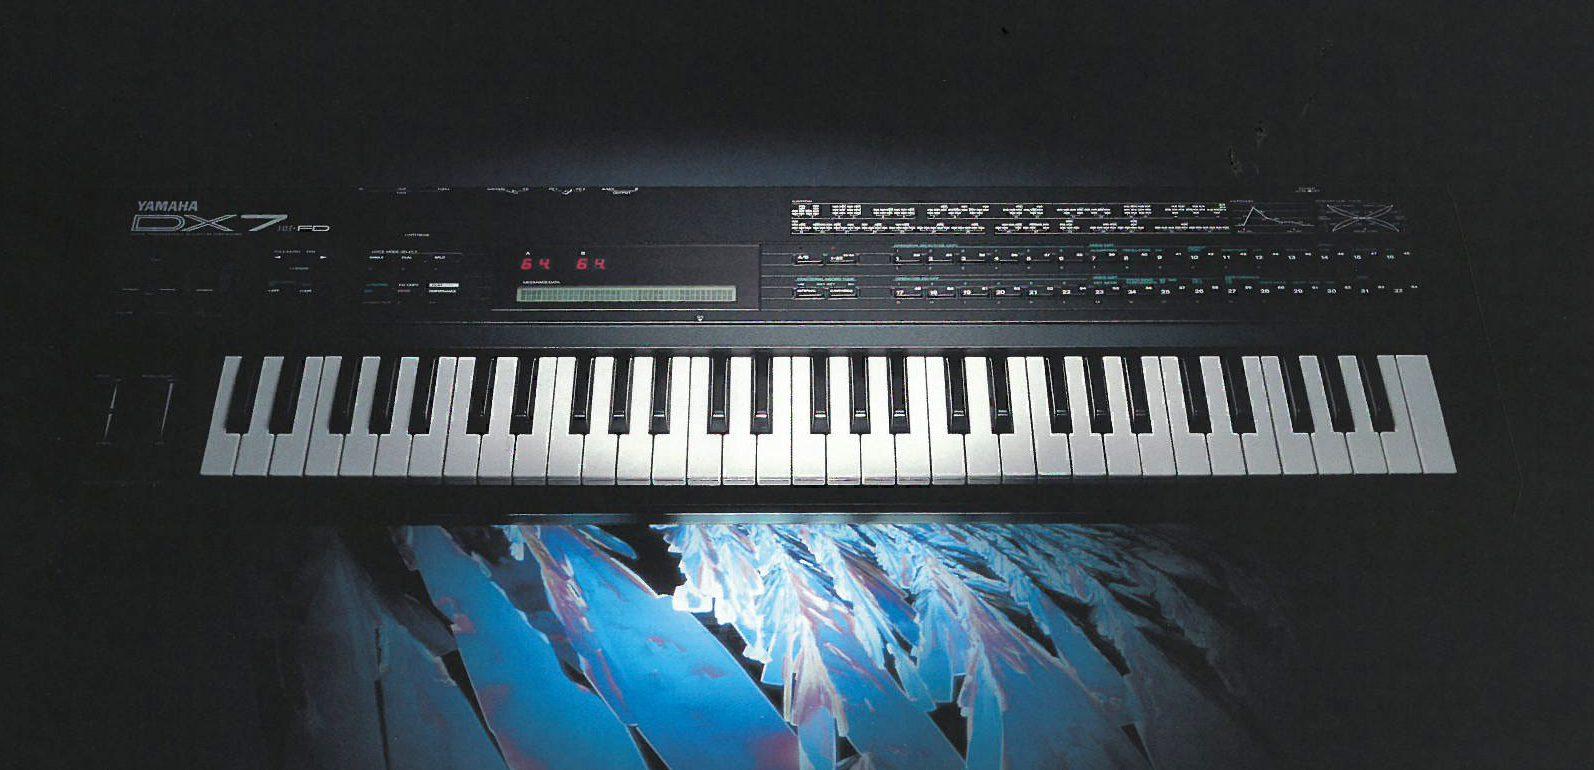 Yamaha DX-7